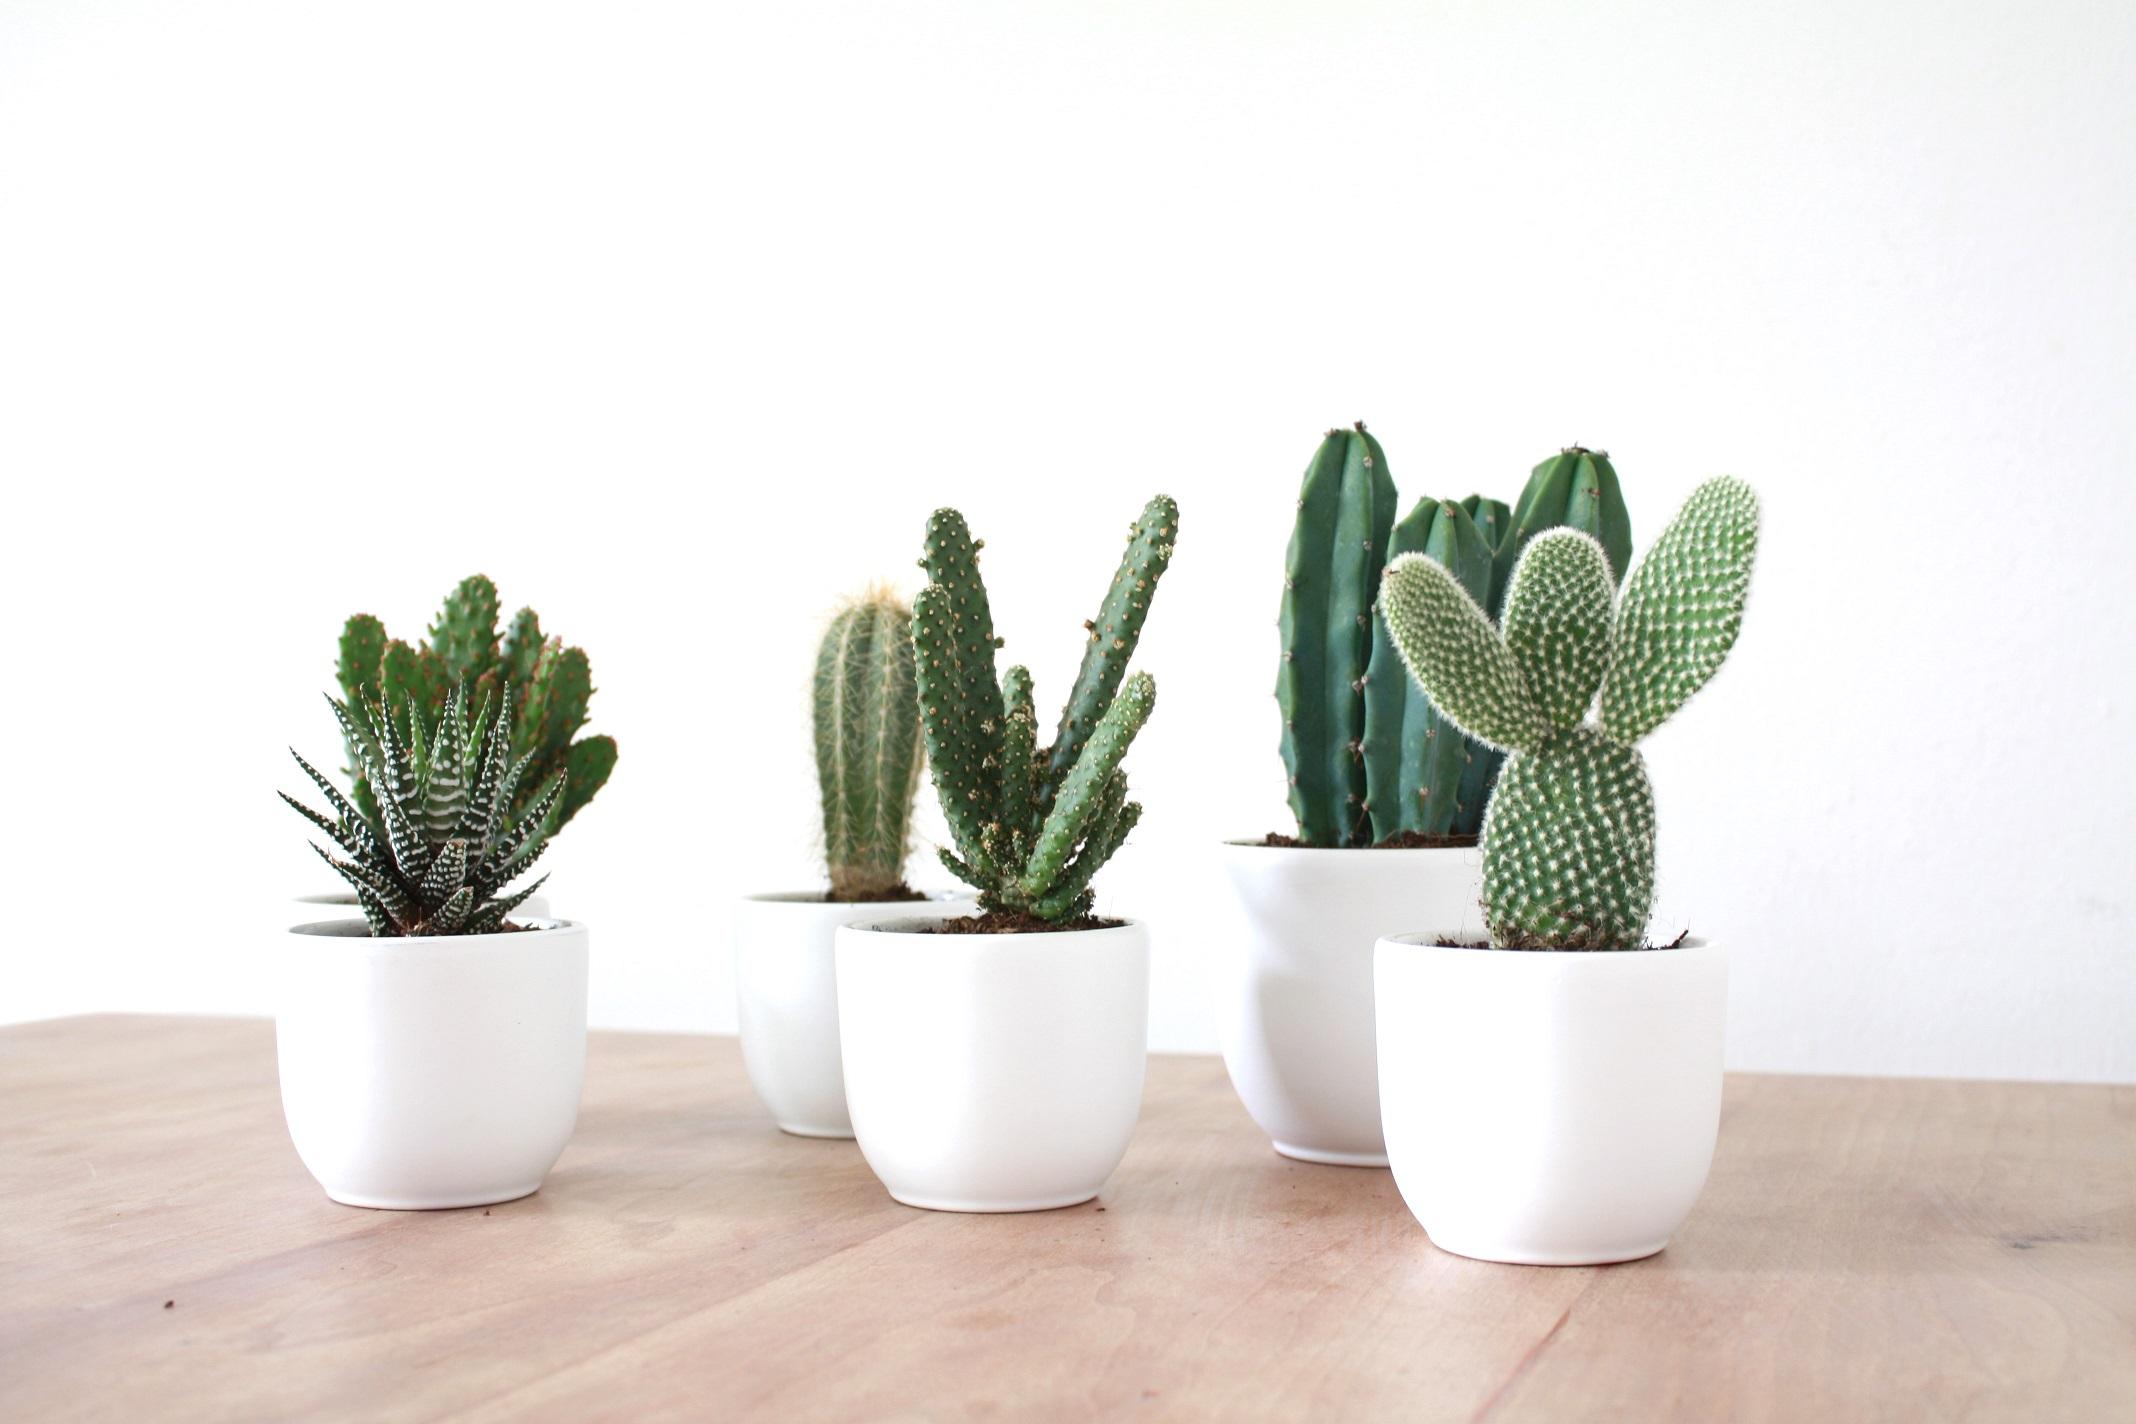 Small Pot Plants Wat Ik Al Heel Lang Wilde Zosammieenzo